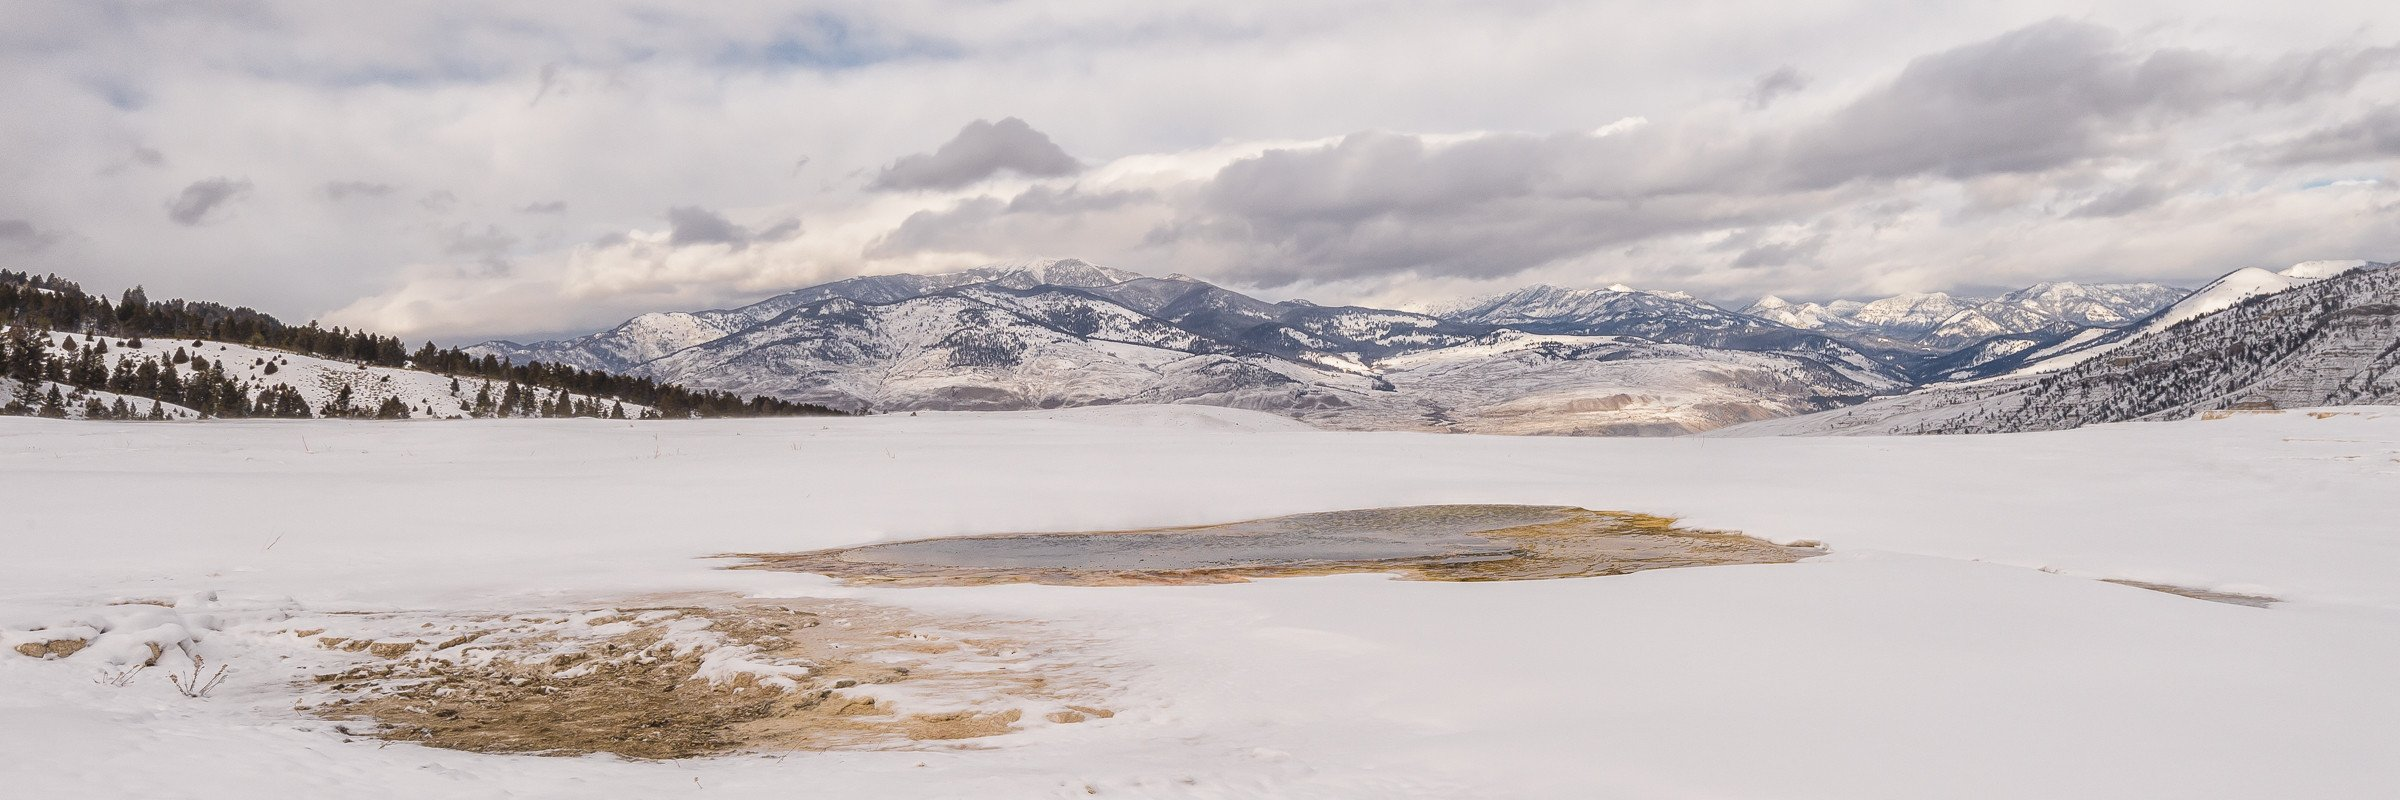 Yellowstone 8300